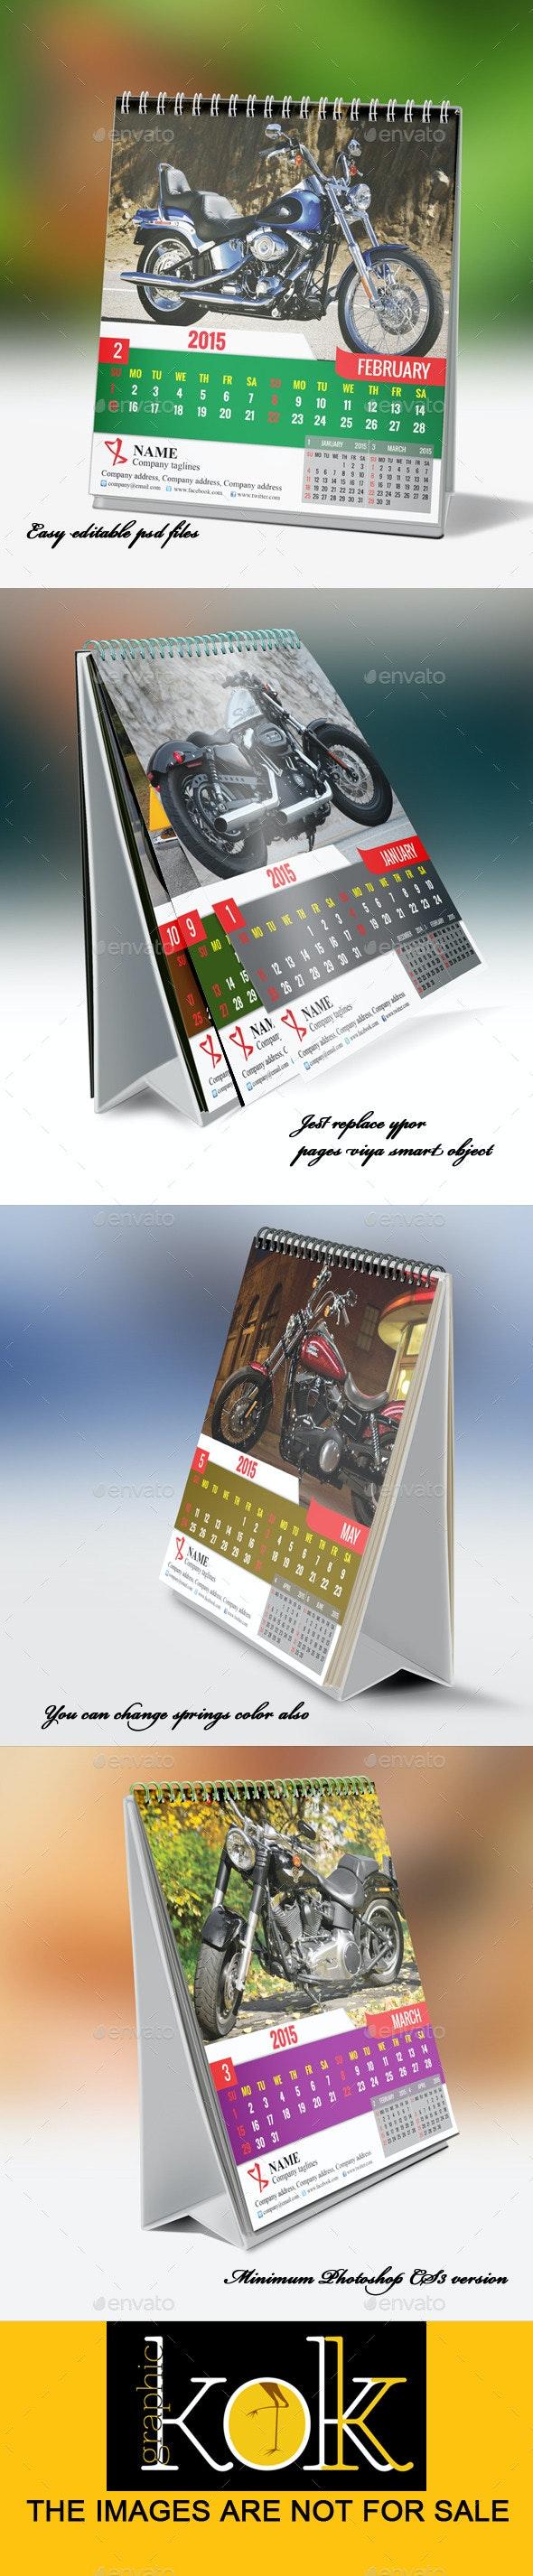 Desktop Calendar Mockup - Graphics